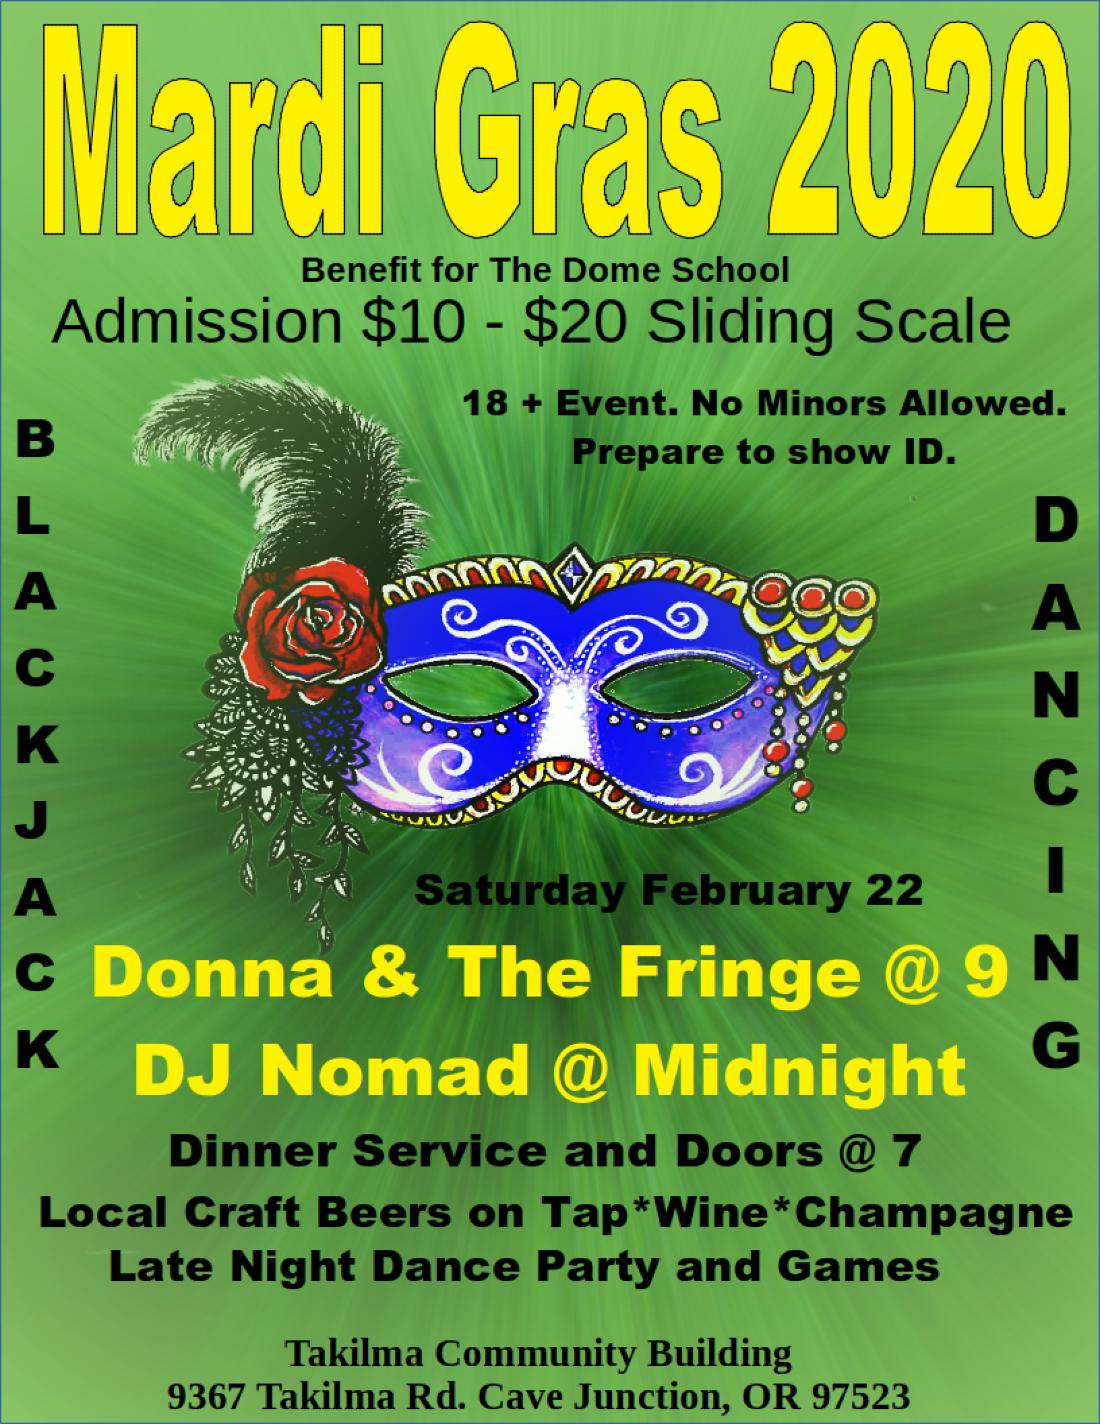 Mardi Gras 2020 A Dome School Benefit